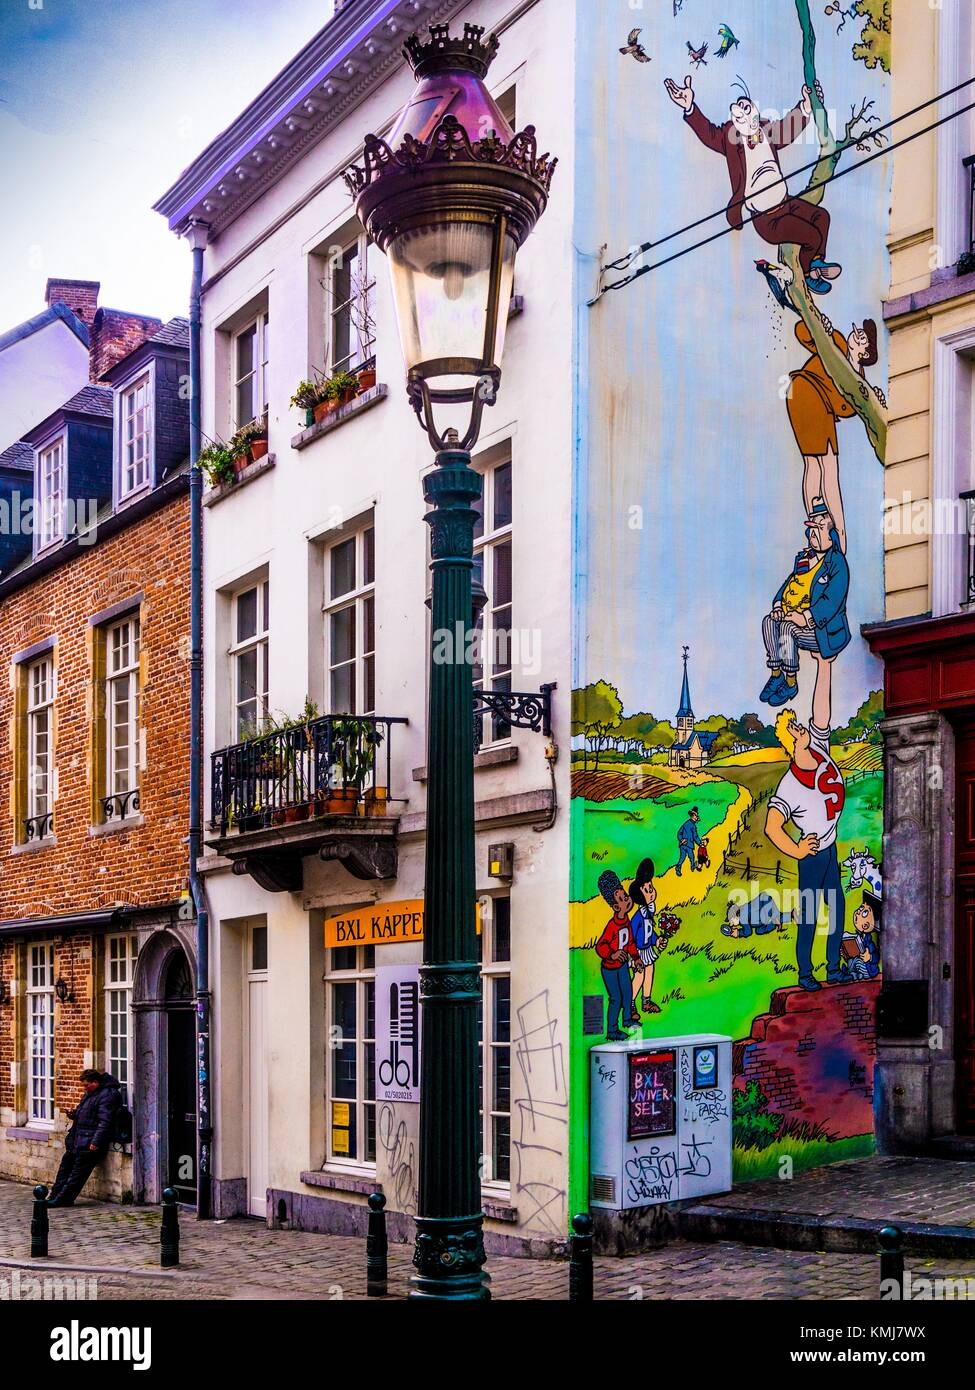 Bélgica. Fachada 'BD' (Comics) en la pared de la calle Saint Géry, Bruselas. Imagen De Stock